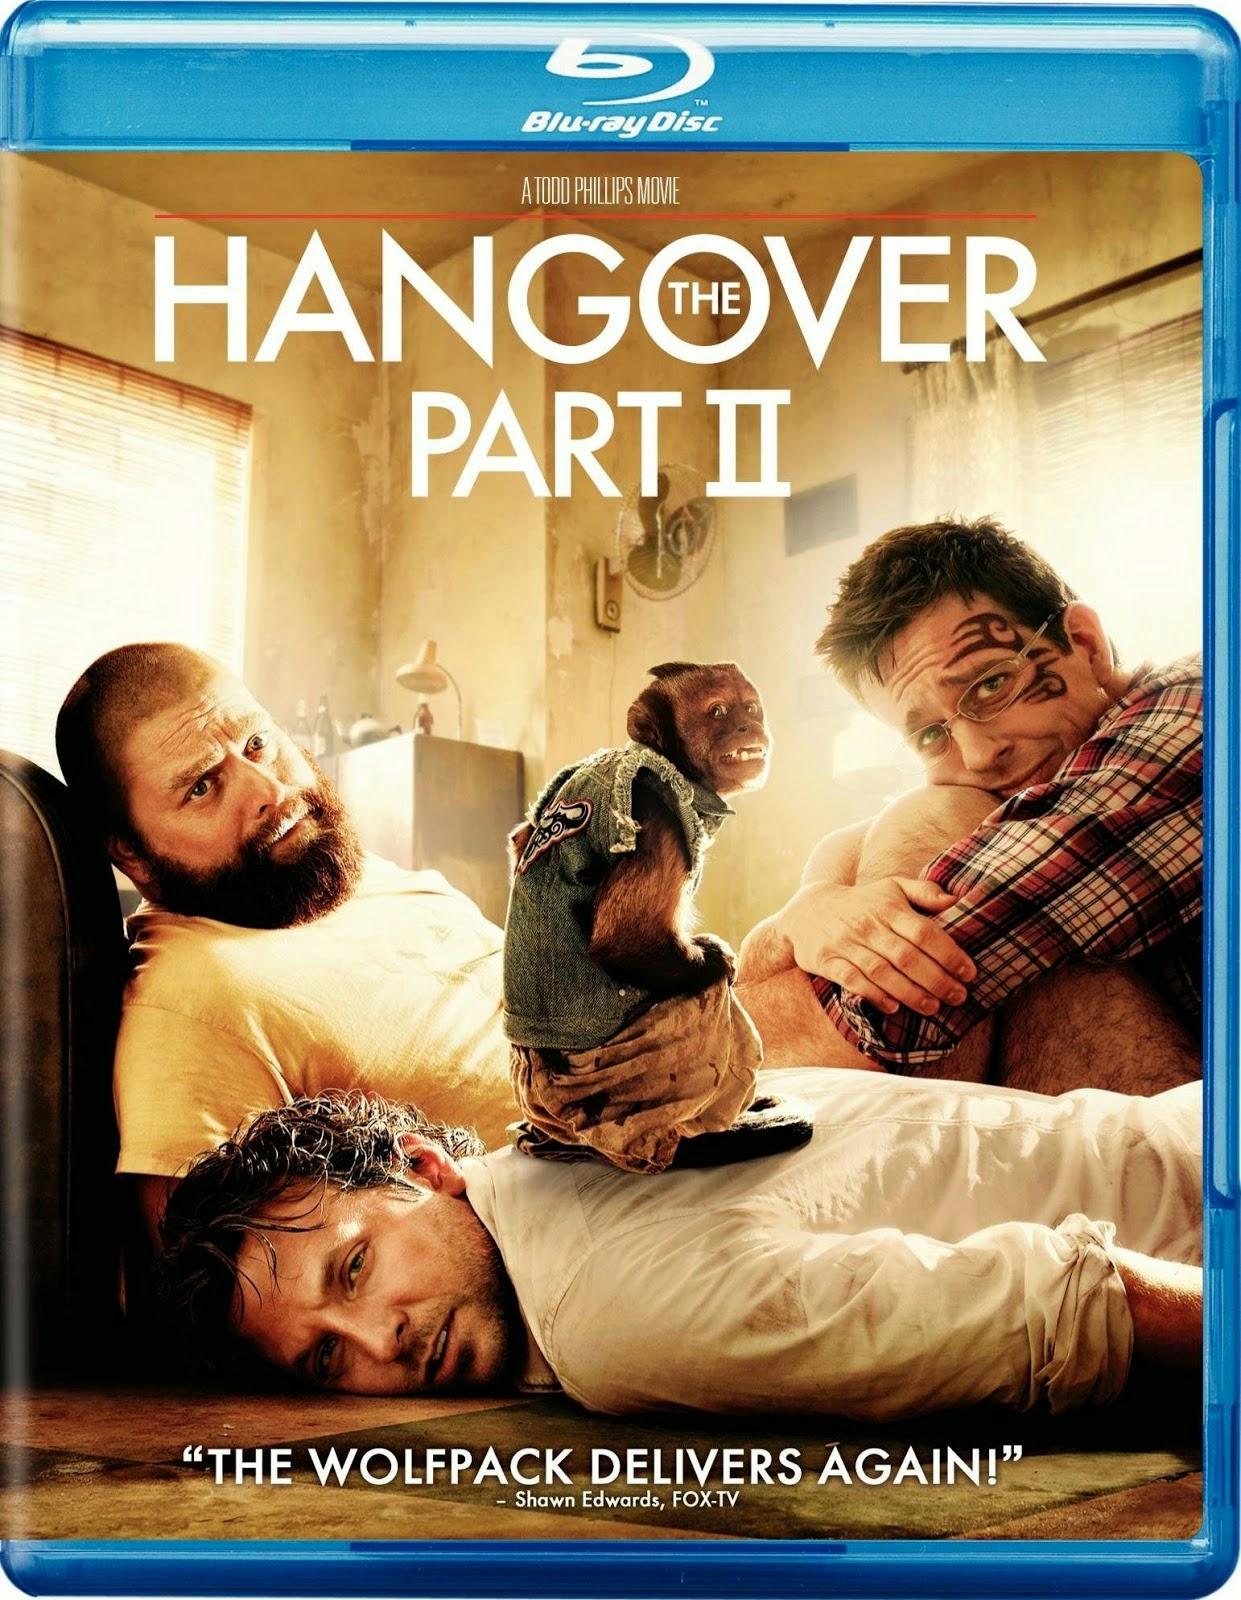 The Hangover Part II - เดอะ แฮงค์โอเวอร์ ภาค 2